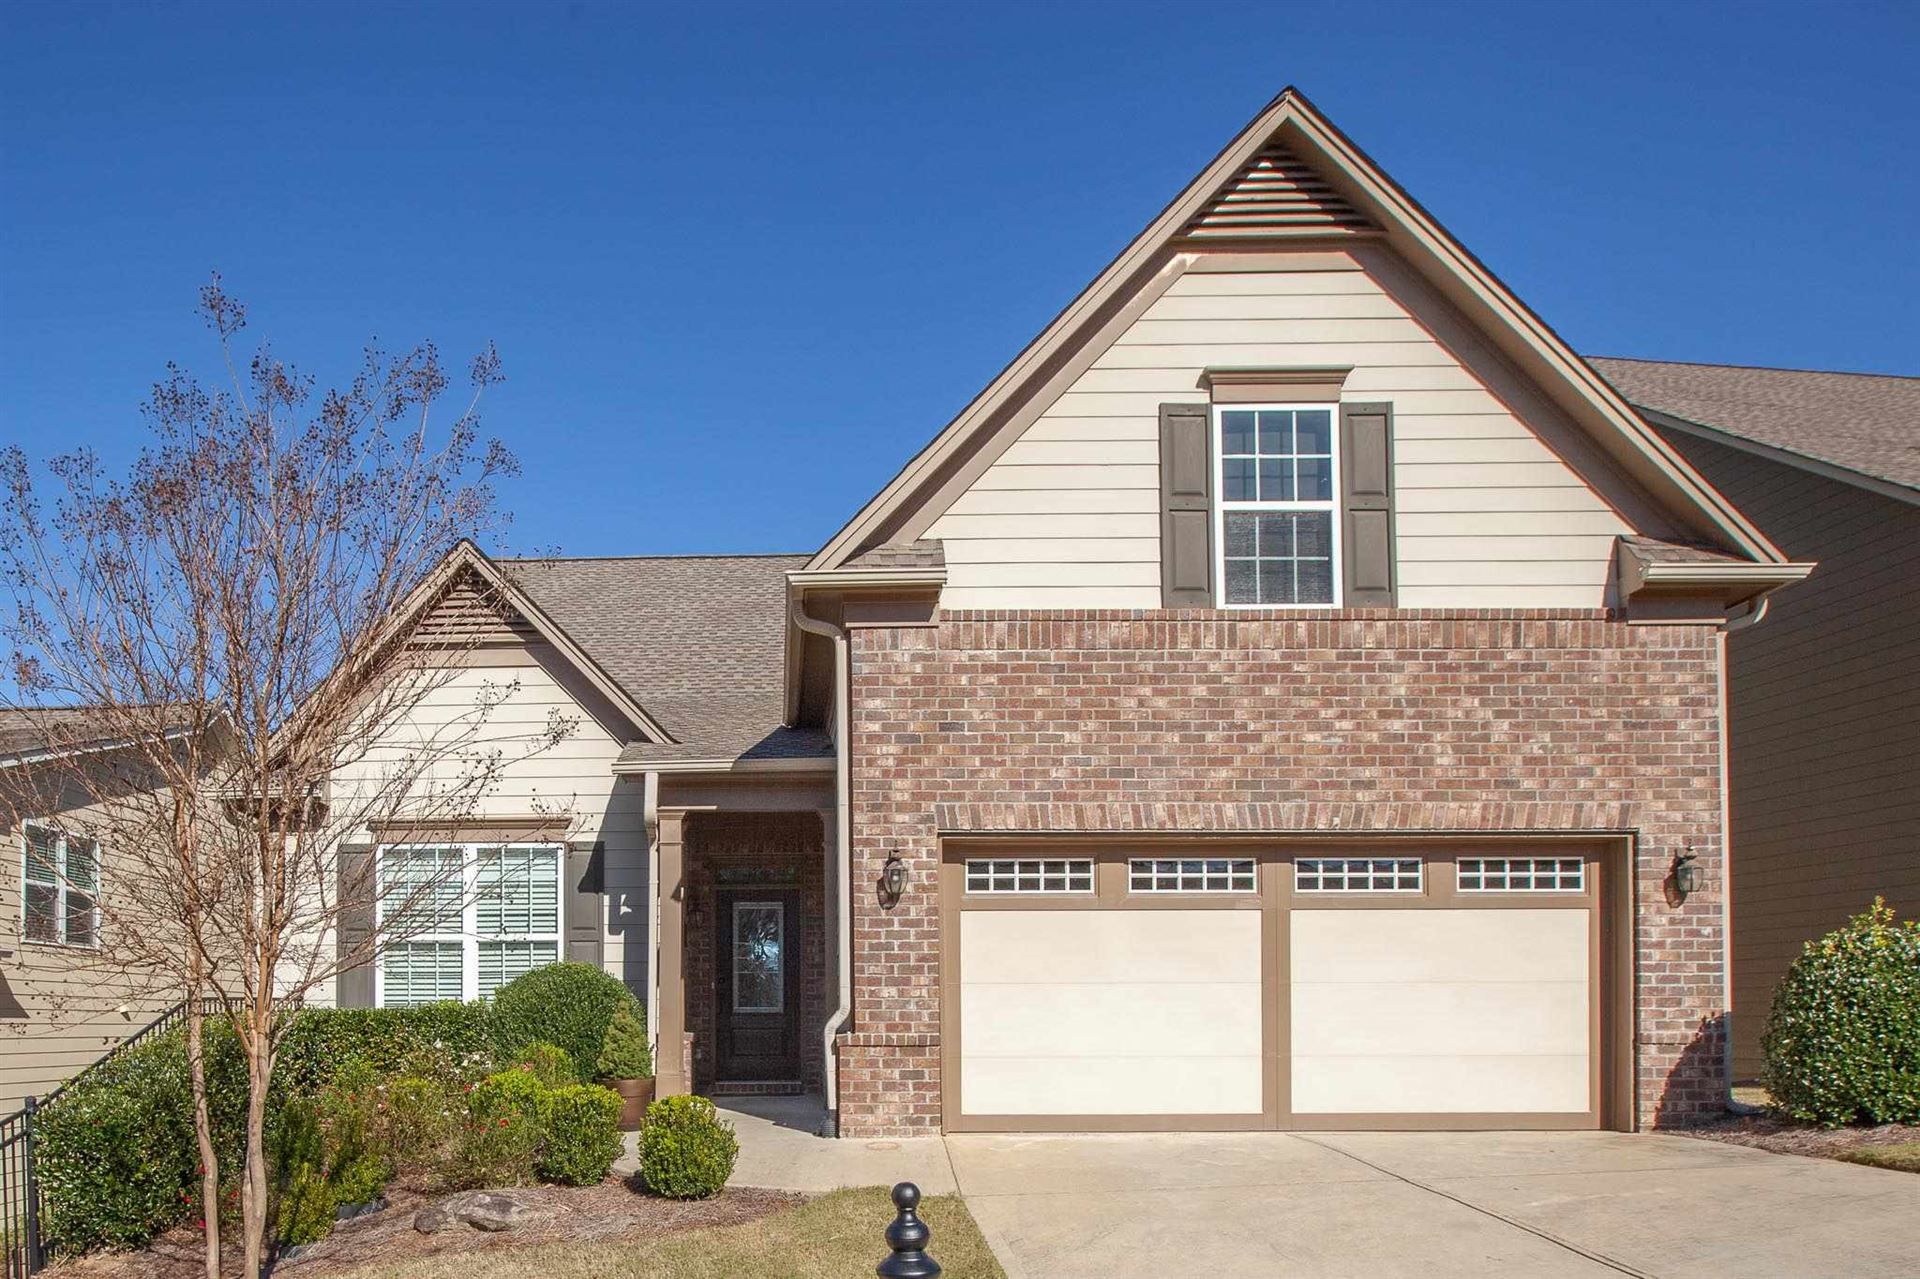 3522 Blue Cypress Cv, Gainesville, GA 30504 - MLS#: 8889145